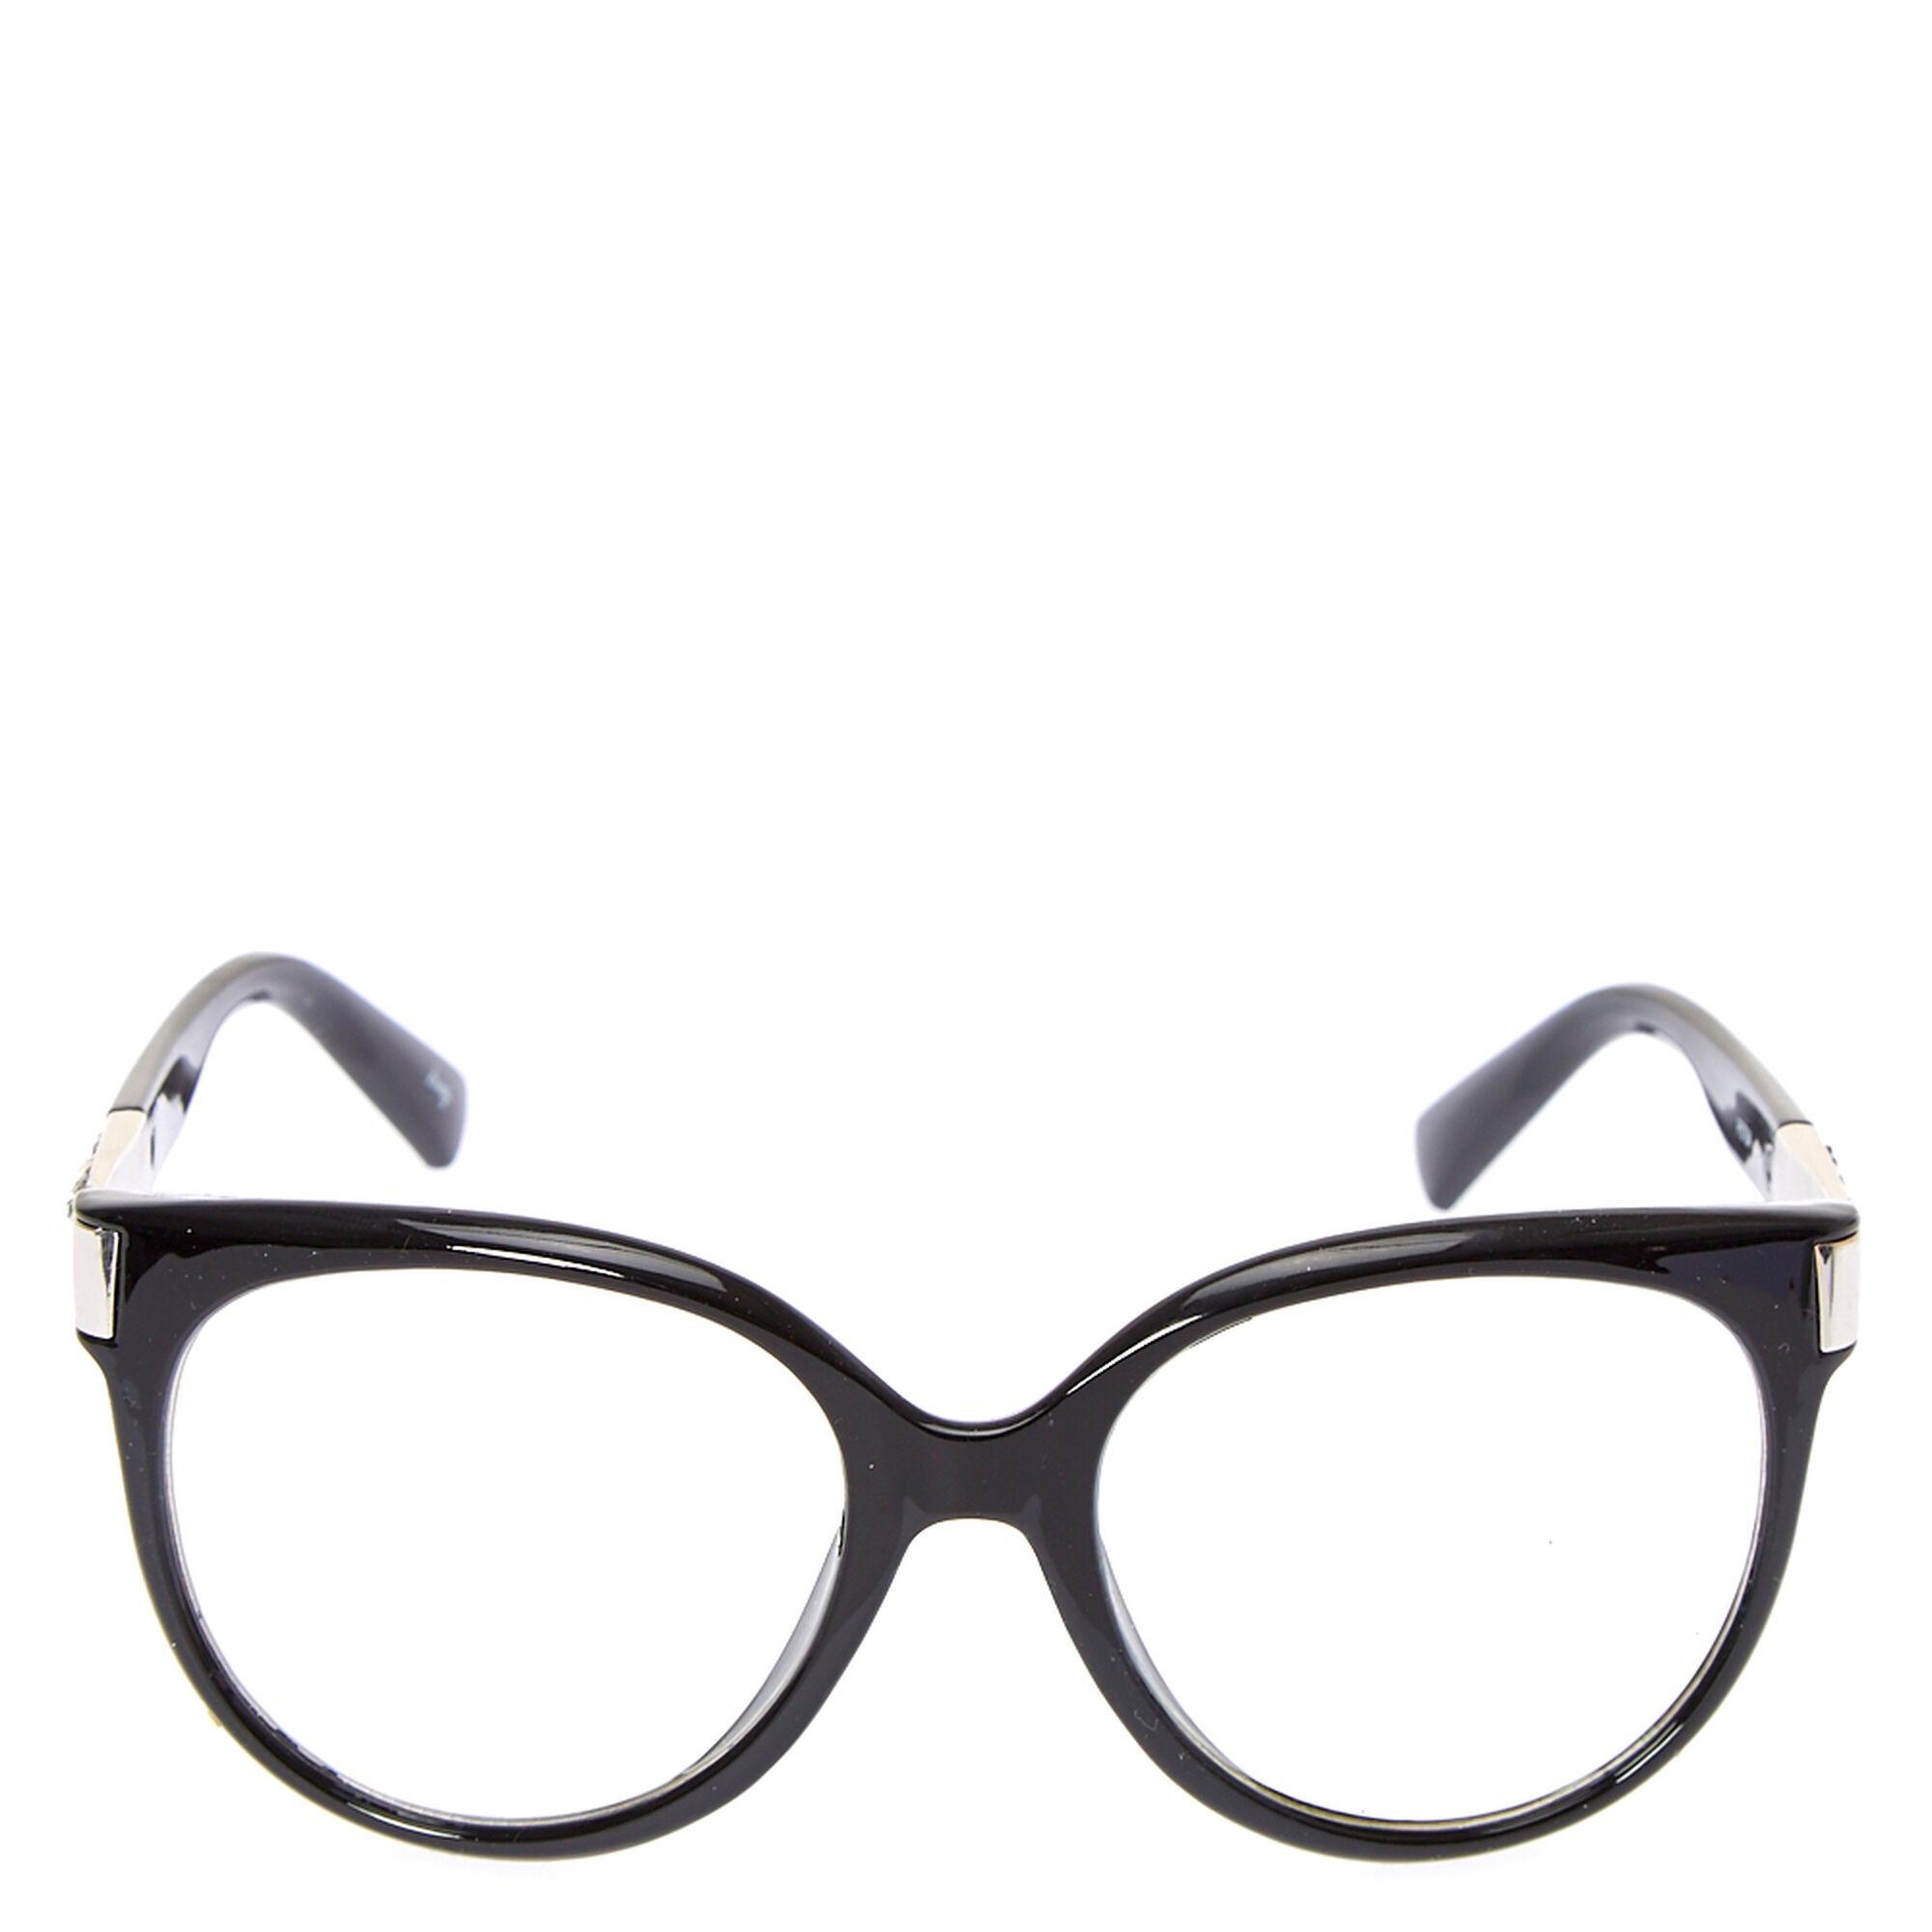 icing fake glasses